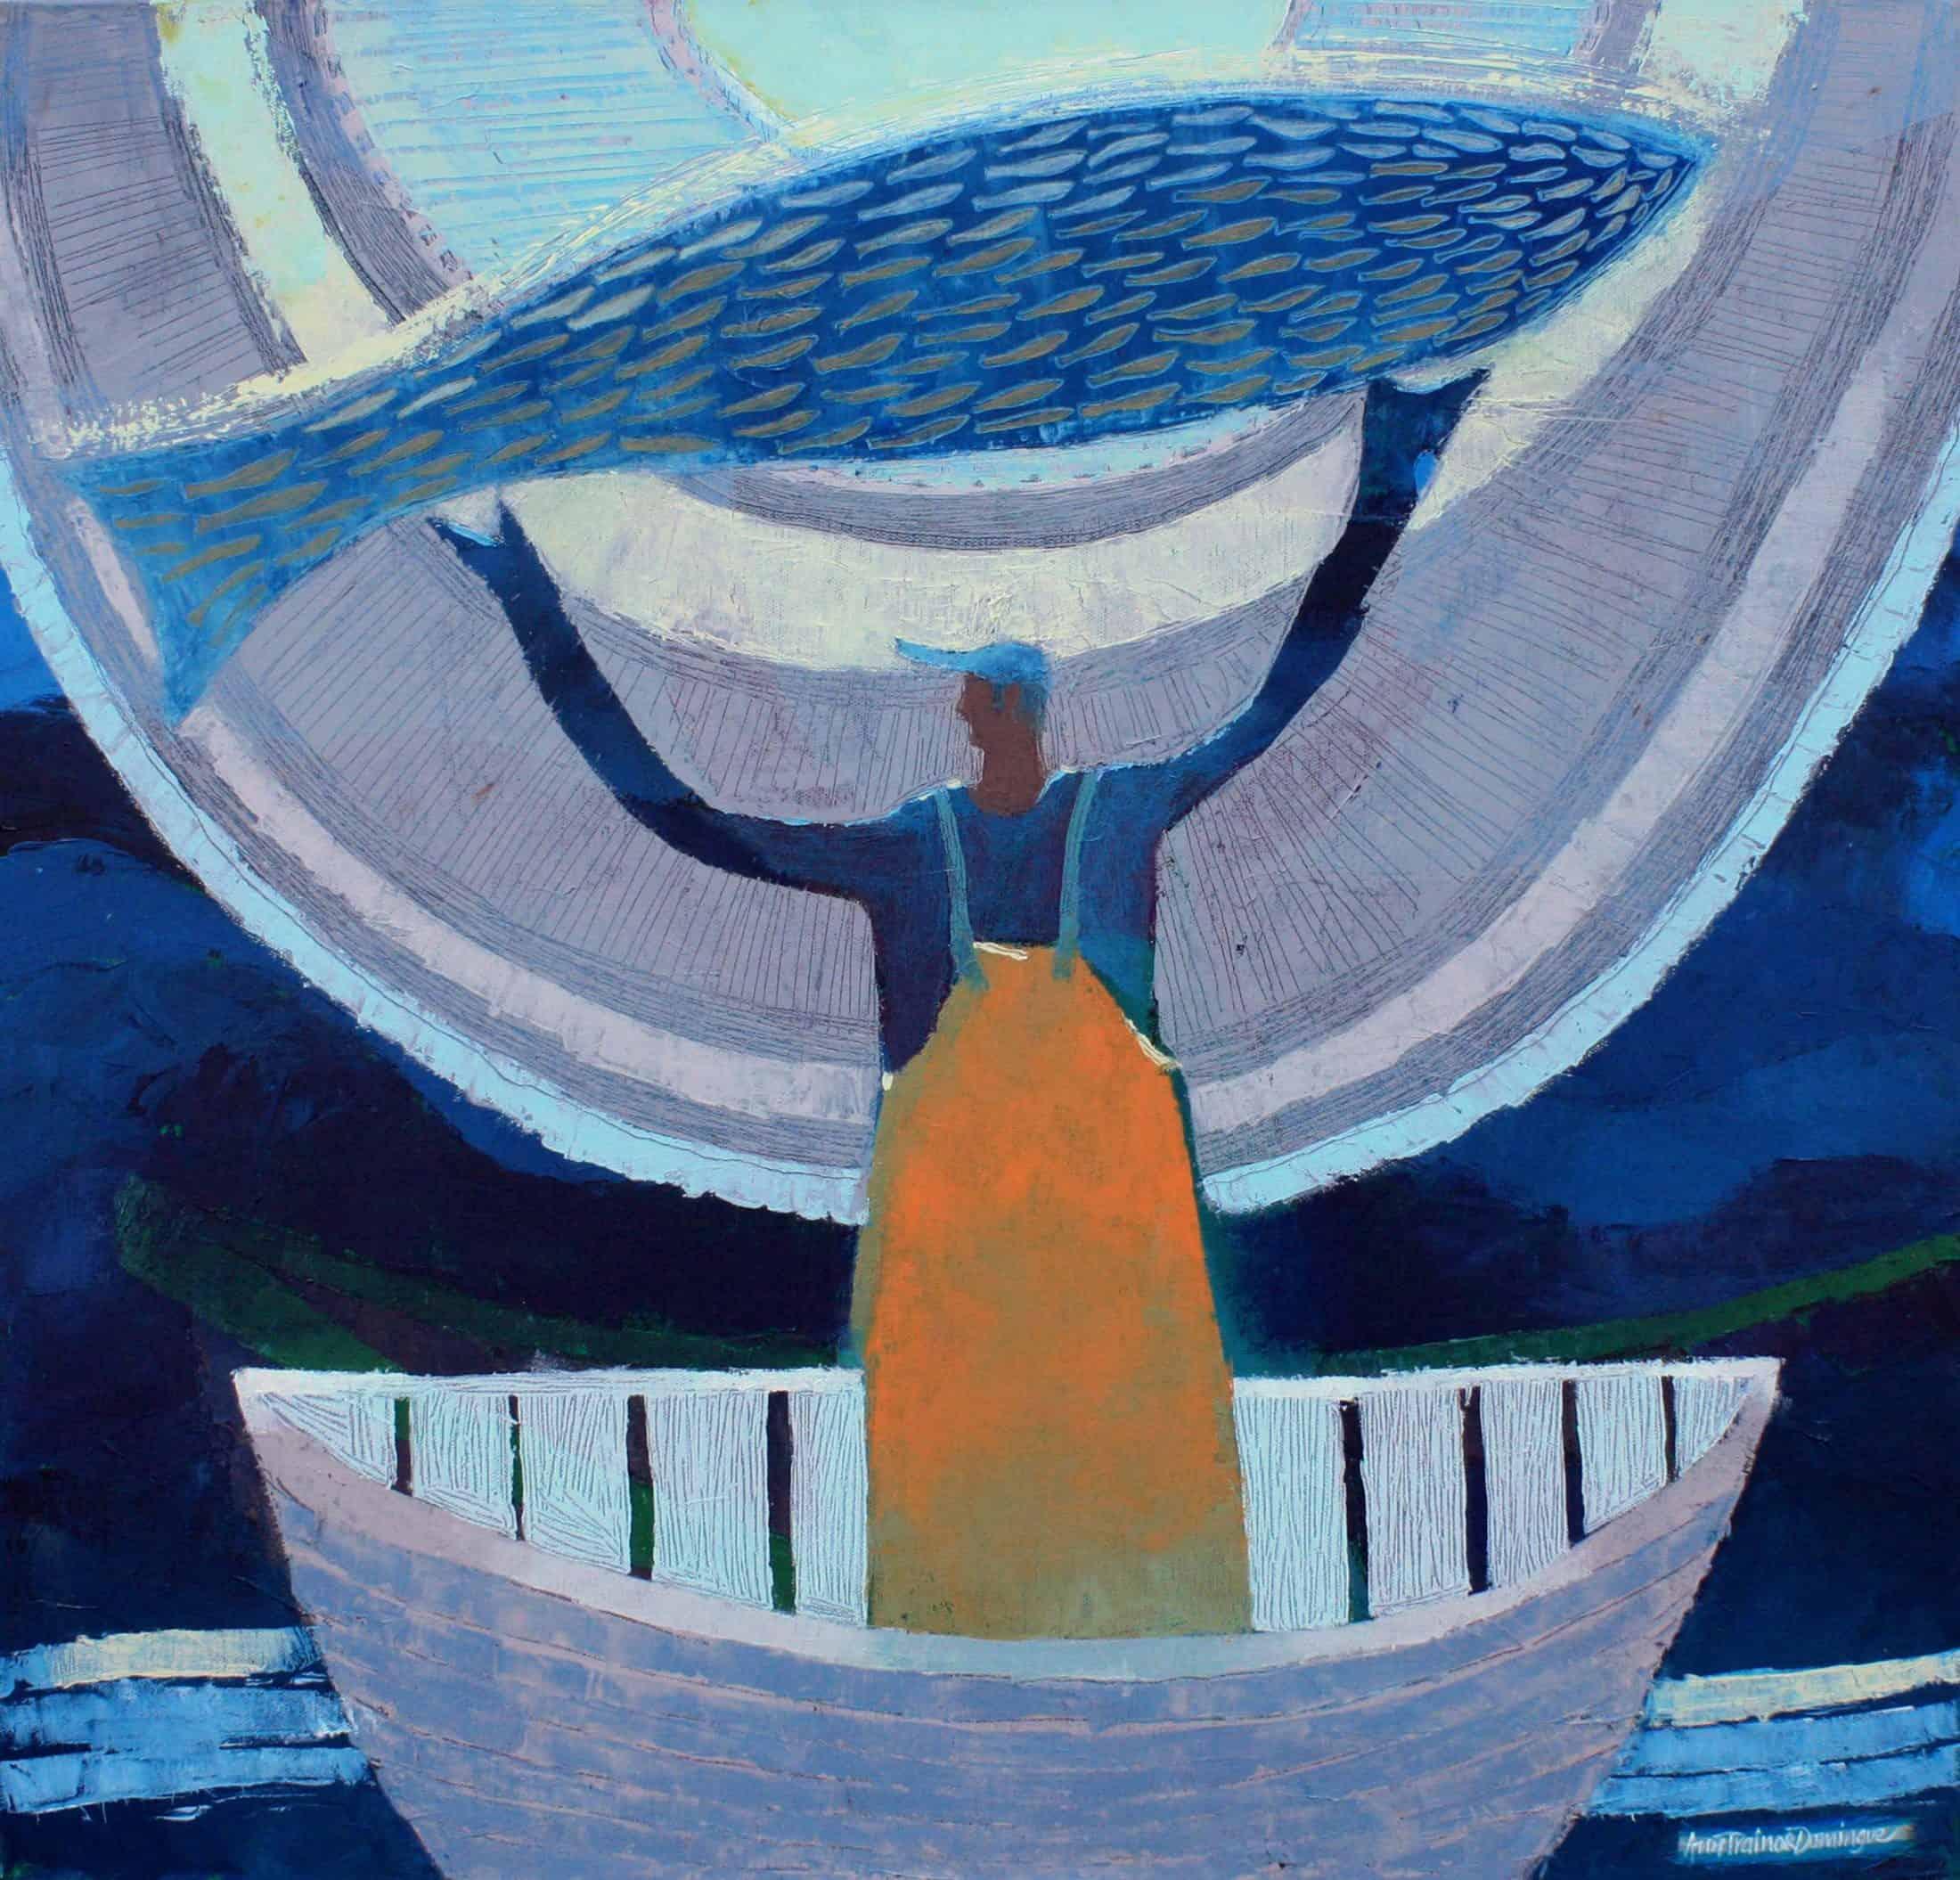 Ann (Mason) Trainor Domingue, Braving the Elements, 2019, acrylic on canvas, 24 x 24 inches